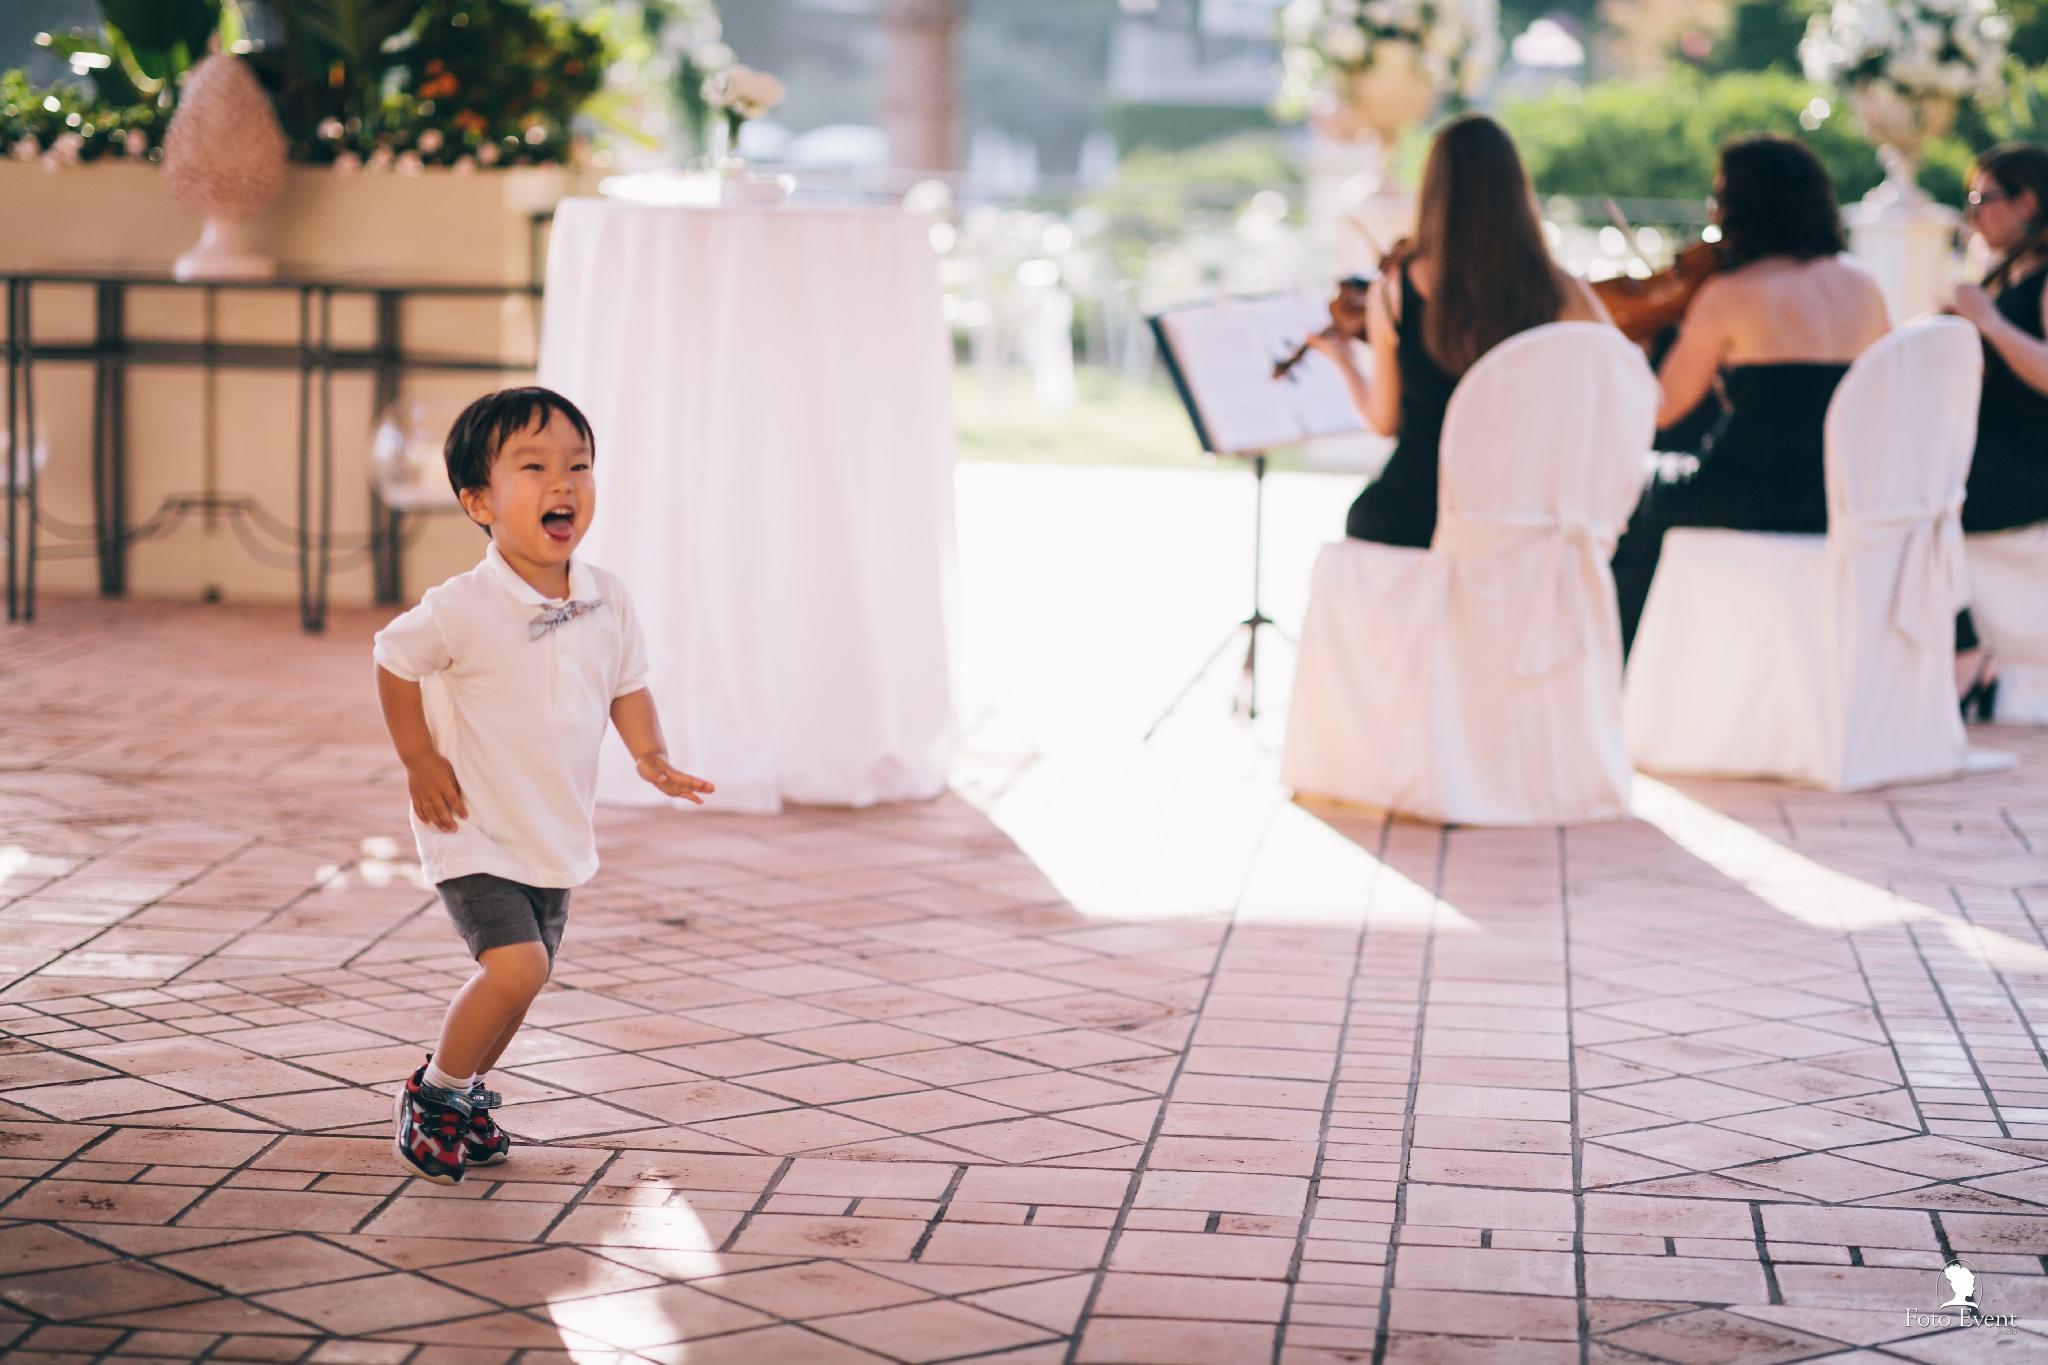 425-2019-06-14-Wedding-Yume-e-Makoto-Isee-80mm-231